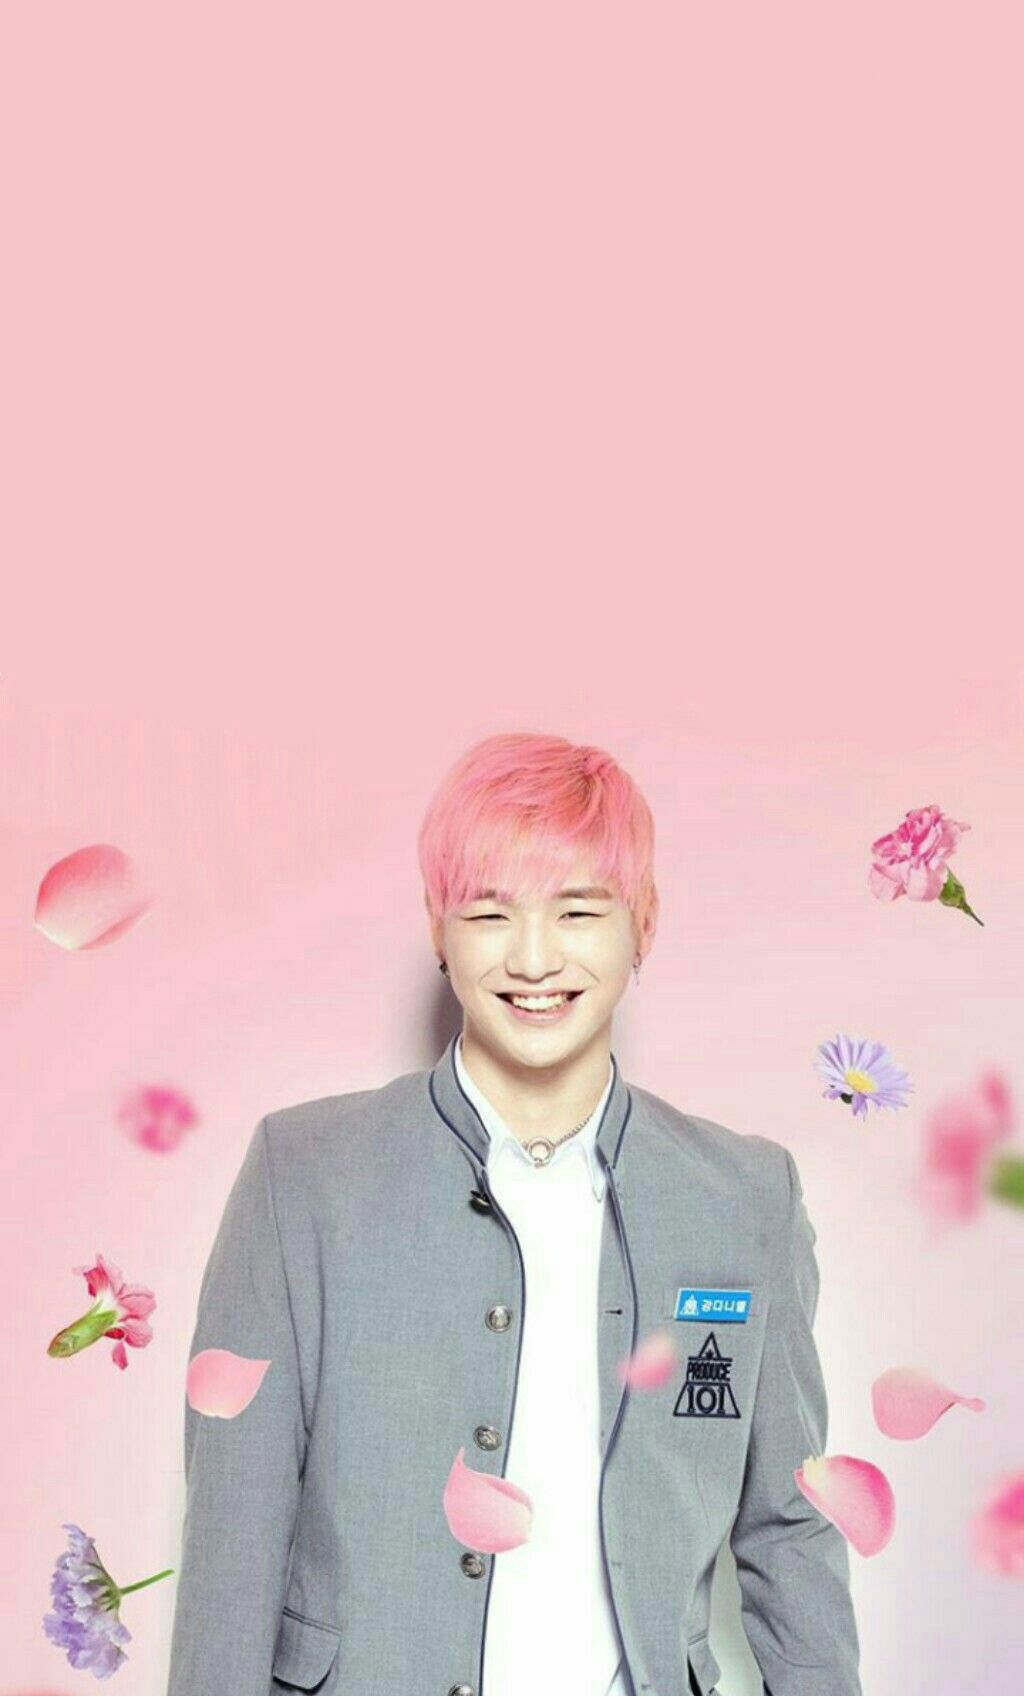 Wallpaper Kang Daniel Produce 101 Season 2 MMO Entertaiment 강다니엘 …